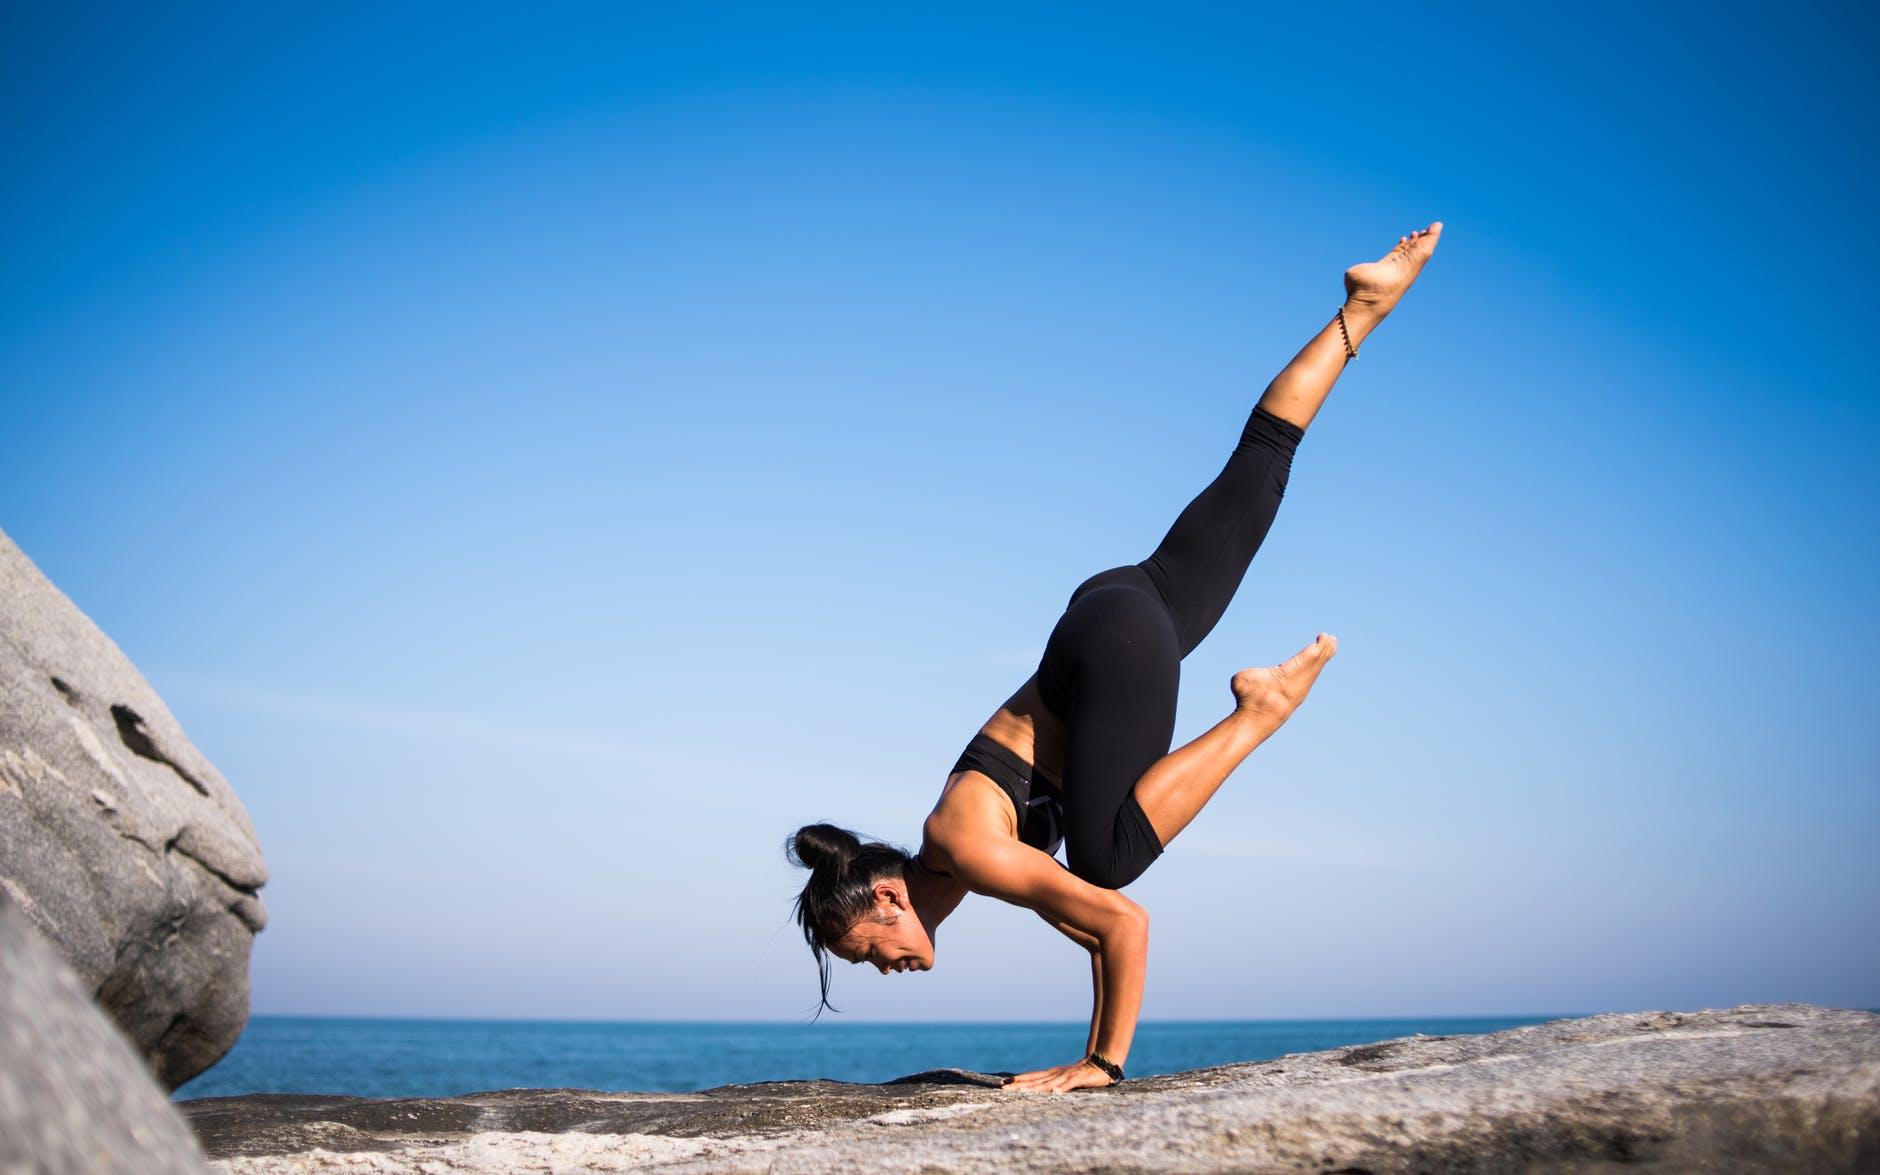 Top 6 Health Benefits of Exercising in 2021